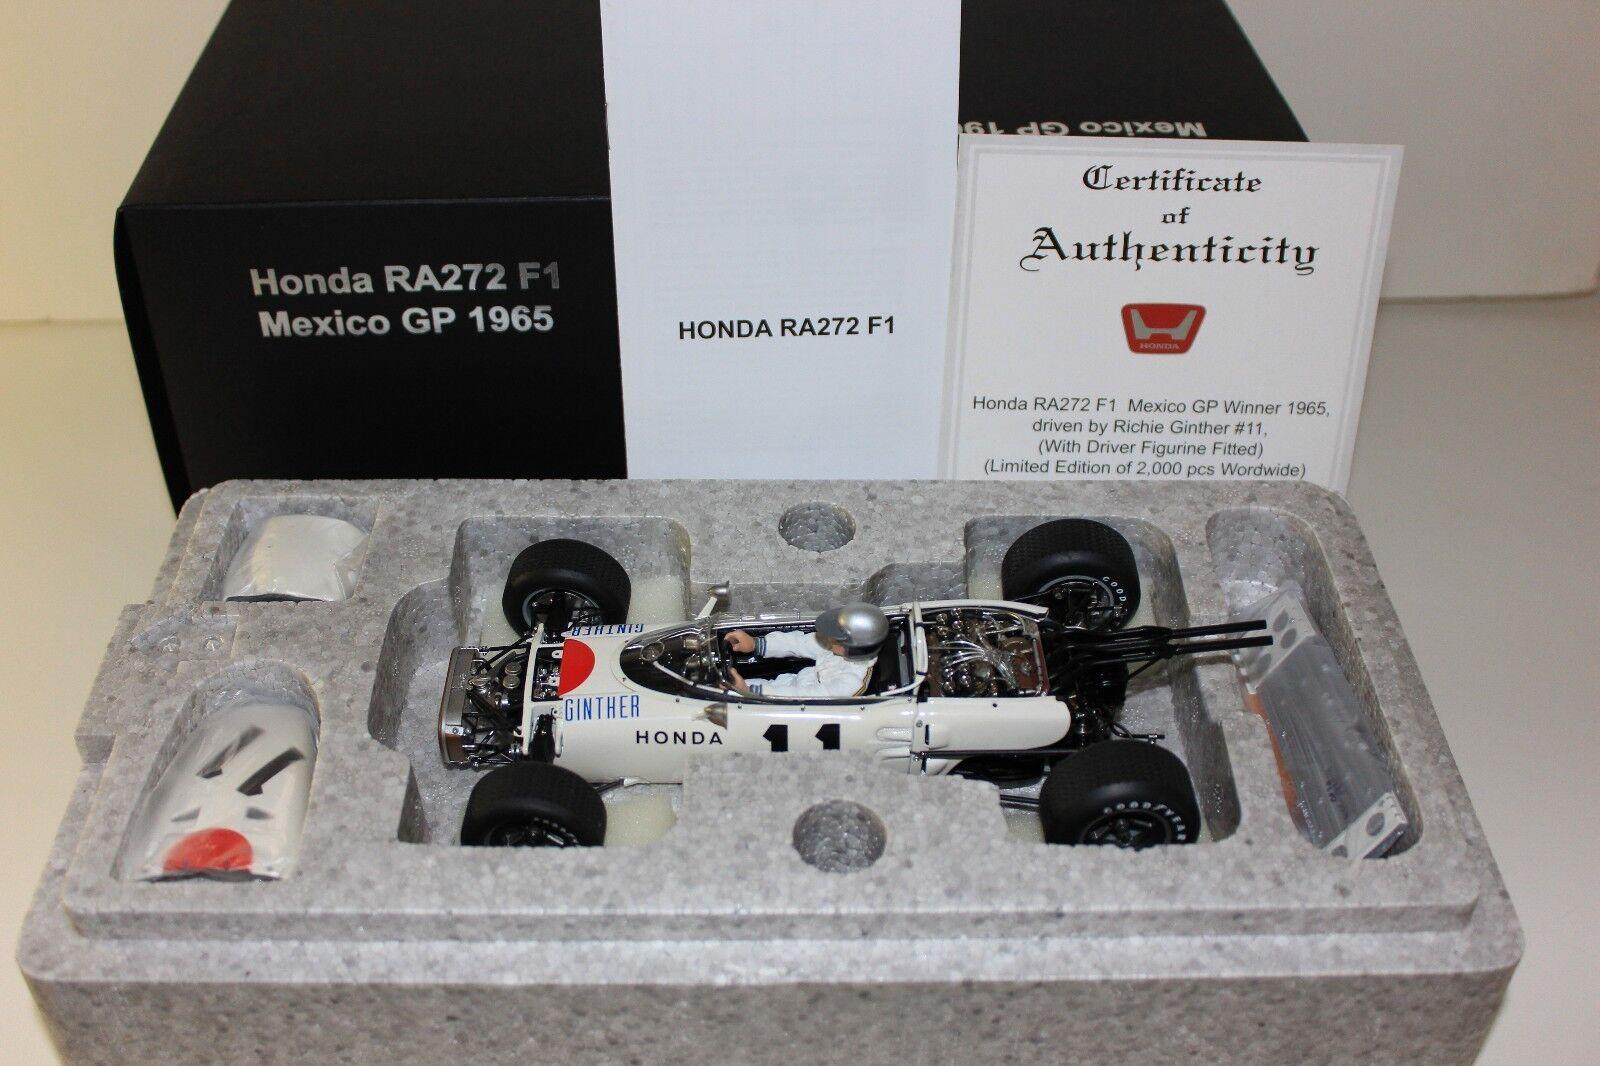 AUTOart 1/18 - - - 1965 Honda RA272 Mexico GP Winner Richie Ginther  11 MINT 86599 423fdc